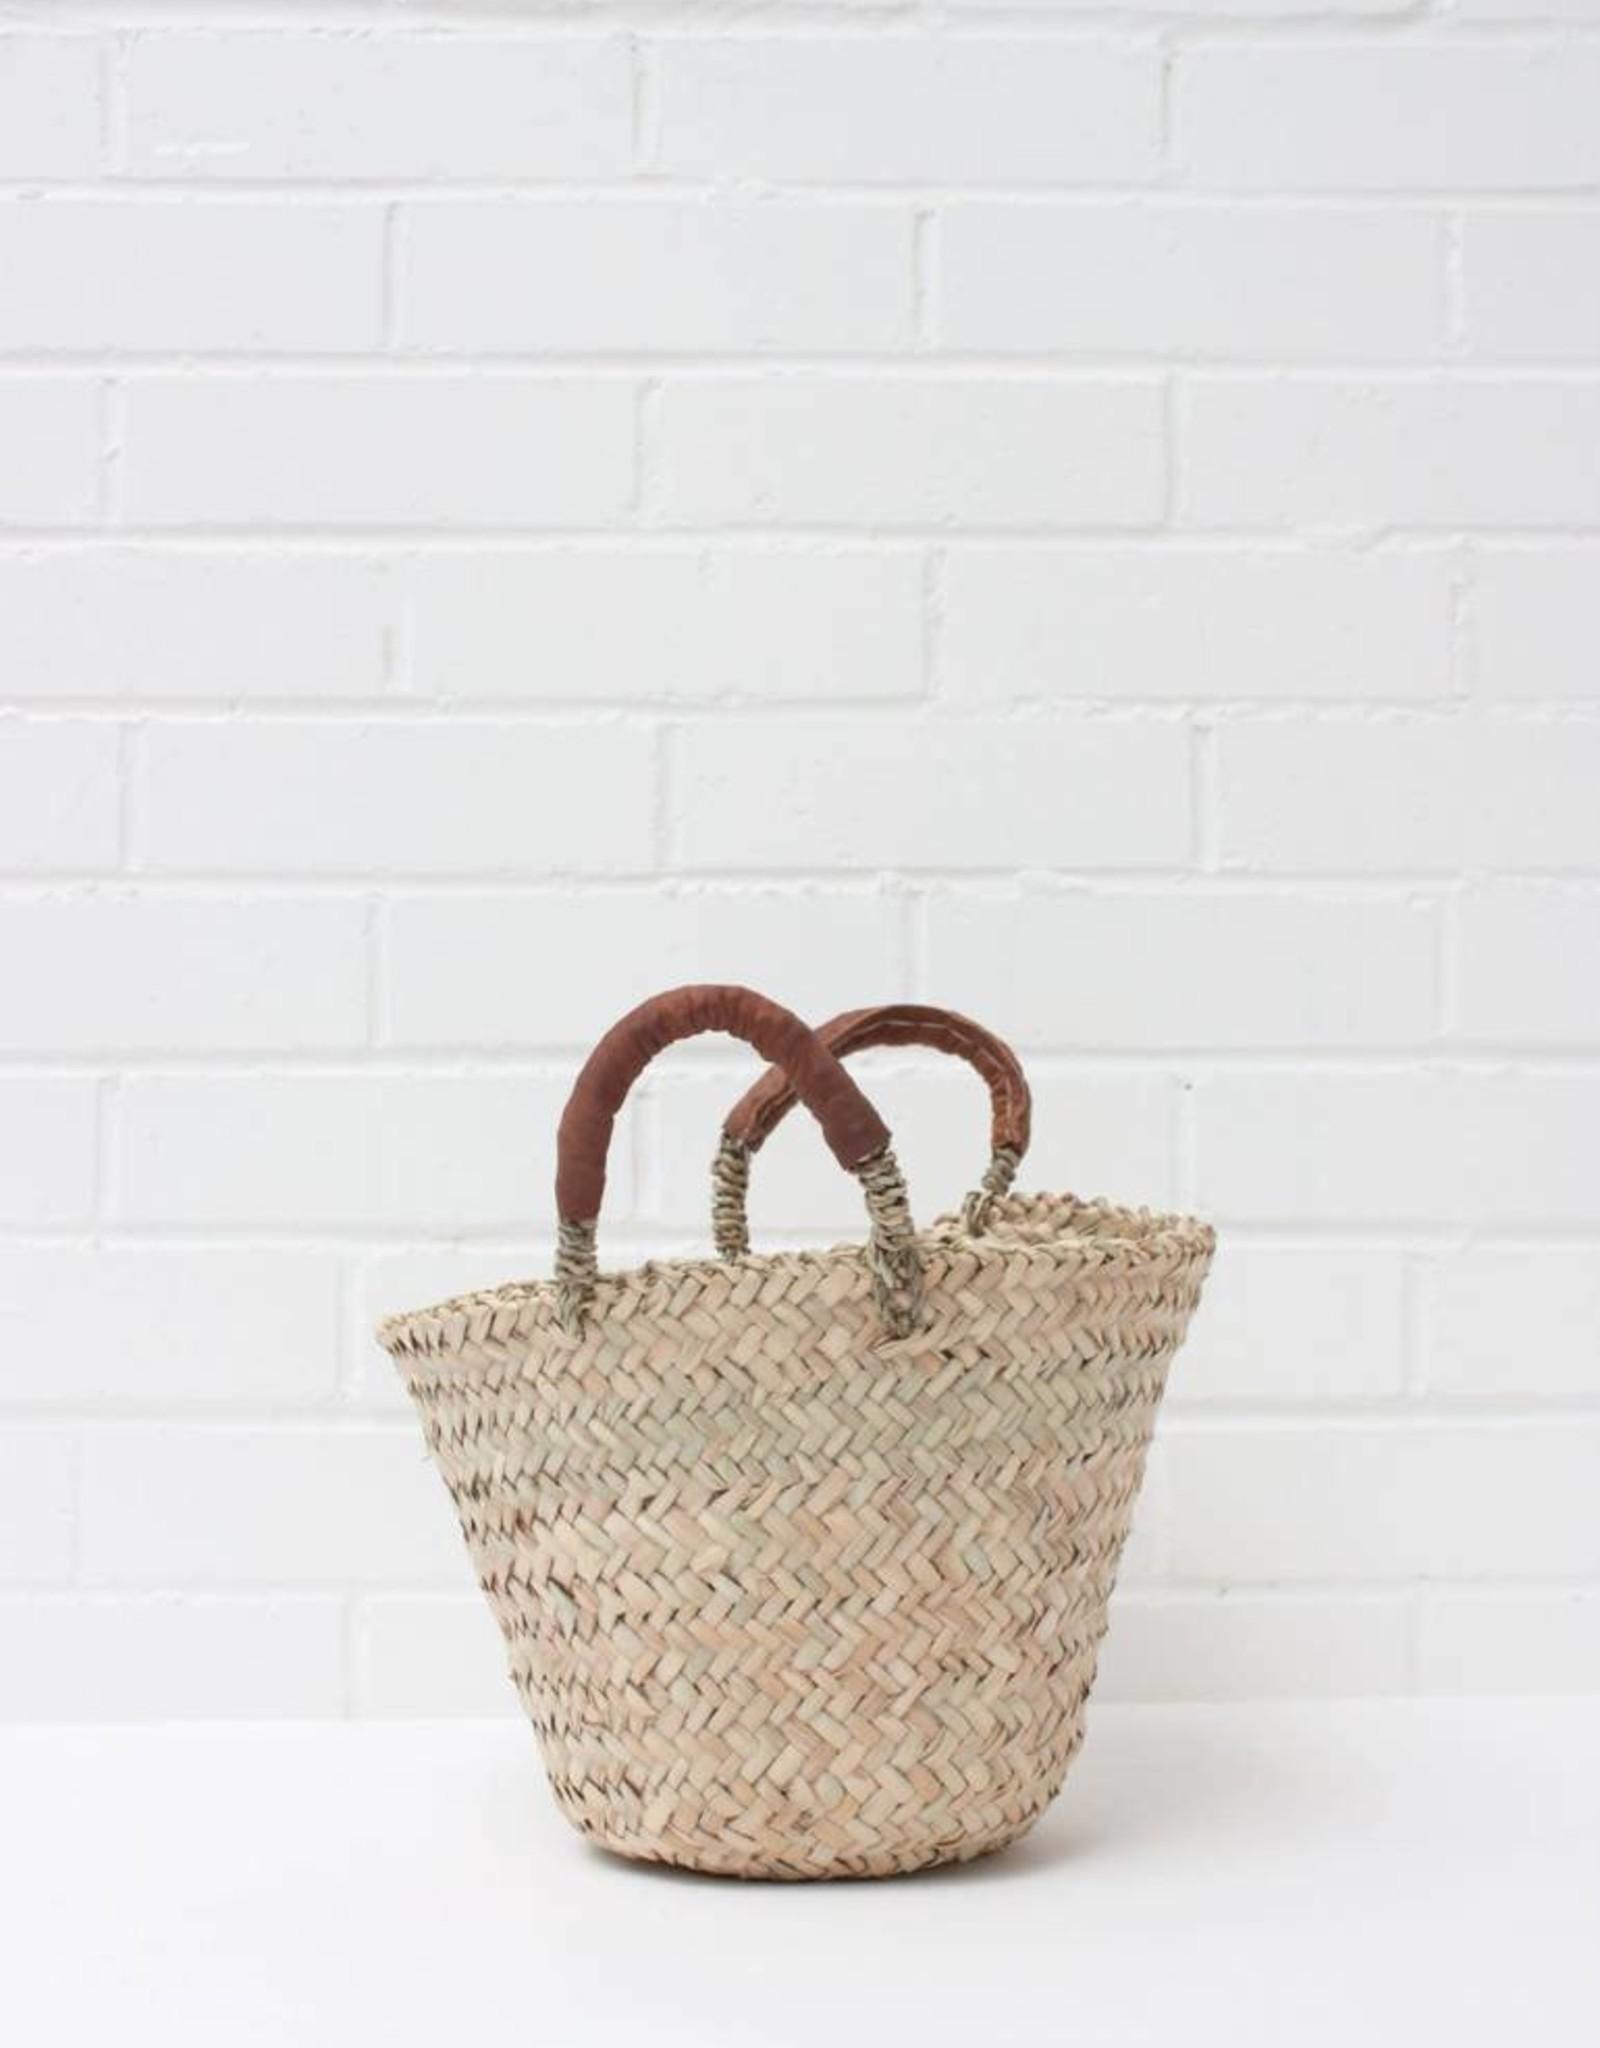 Beldi Leather Basket - Tan - Small